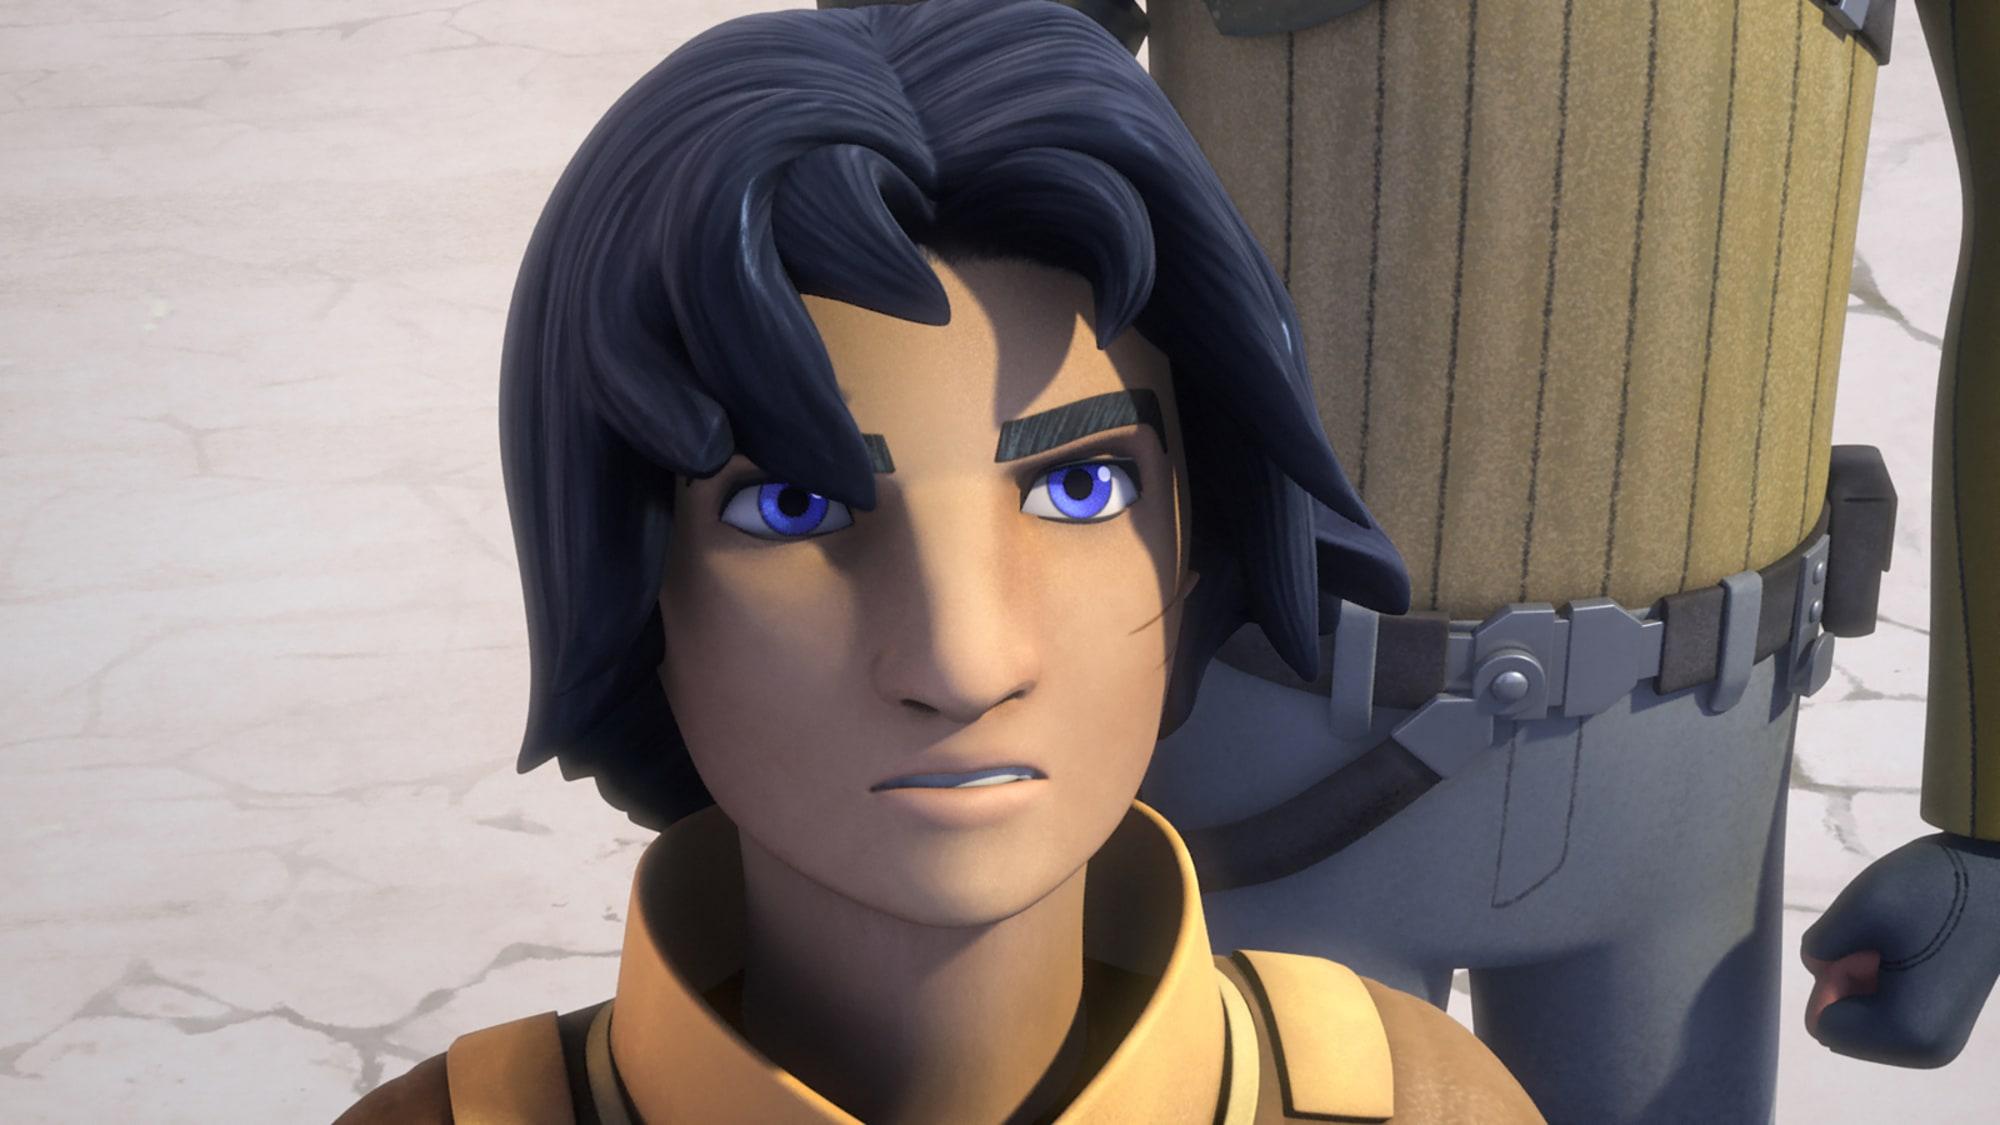 Rahul Kohl to play Jedi Ezra Bridger in The Mandalorian season 2?